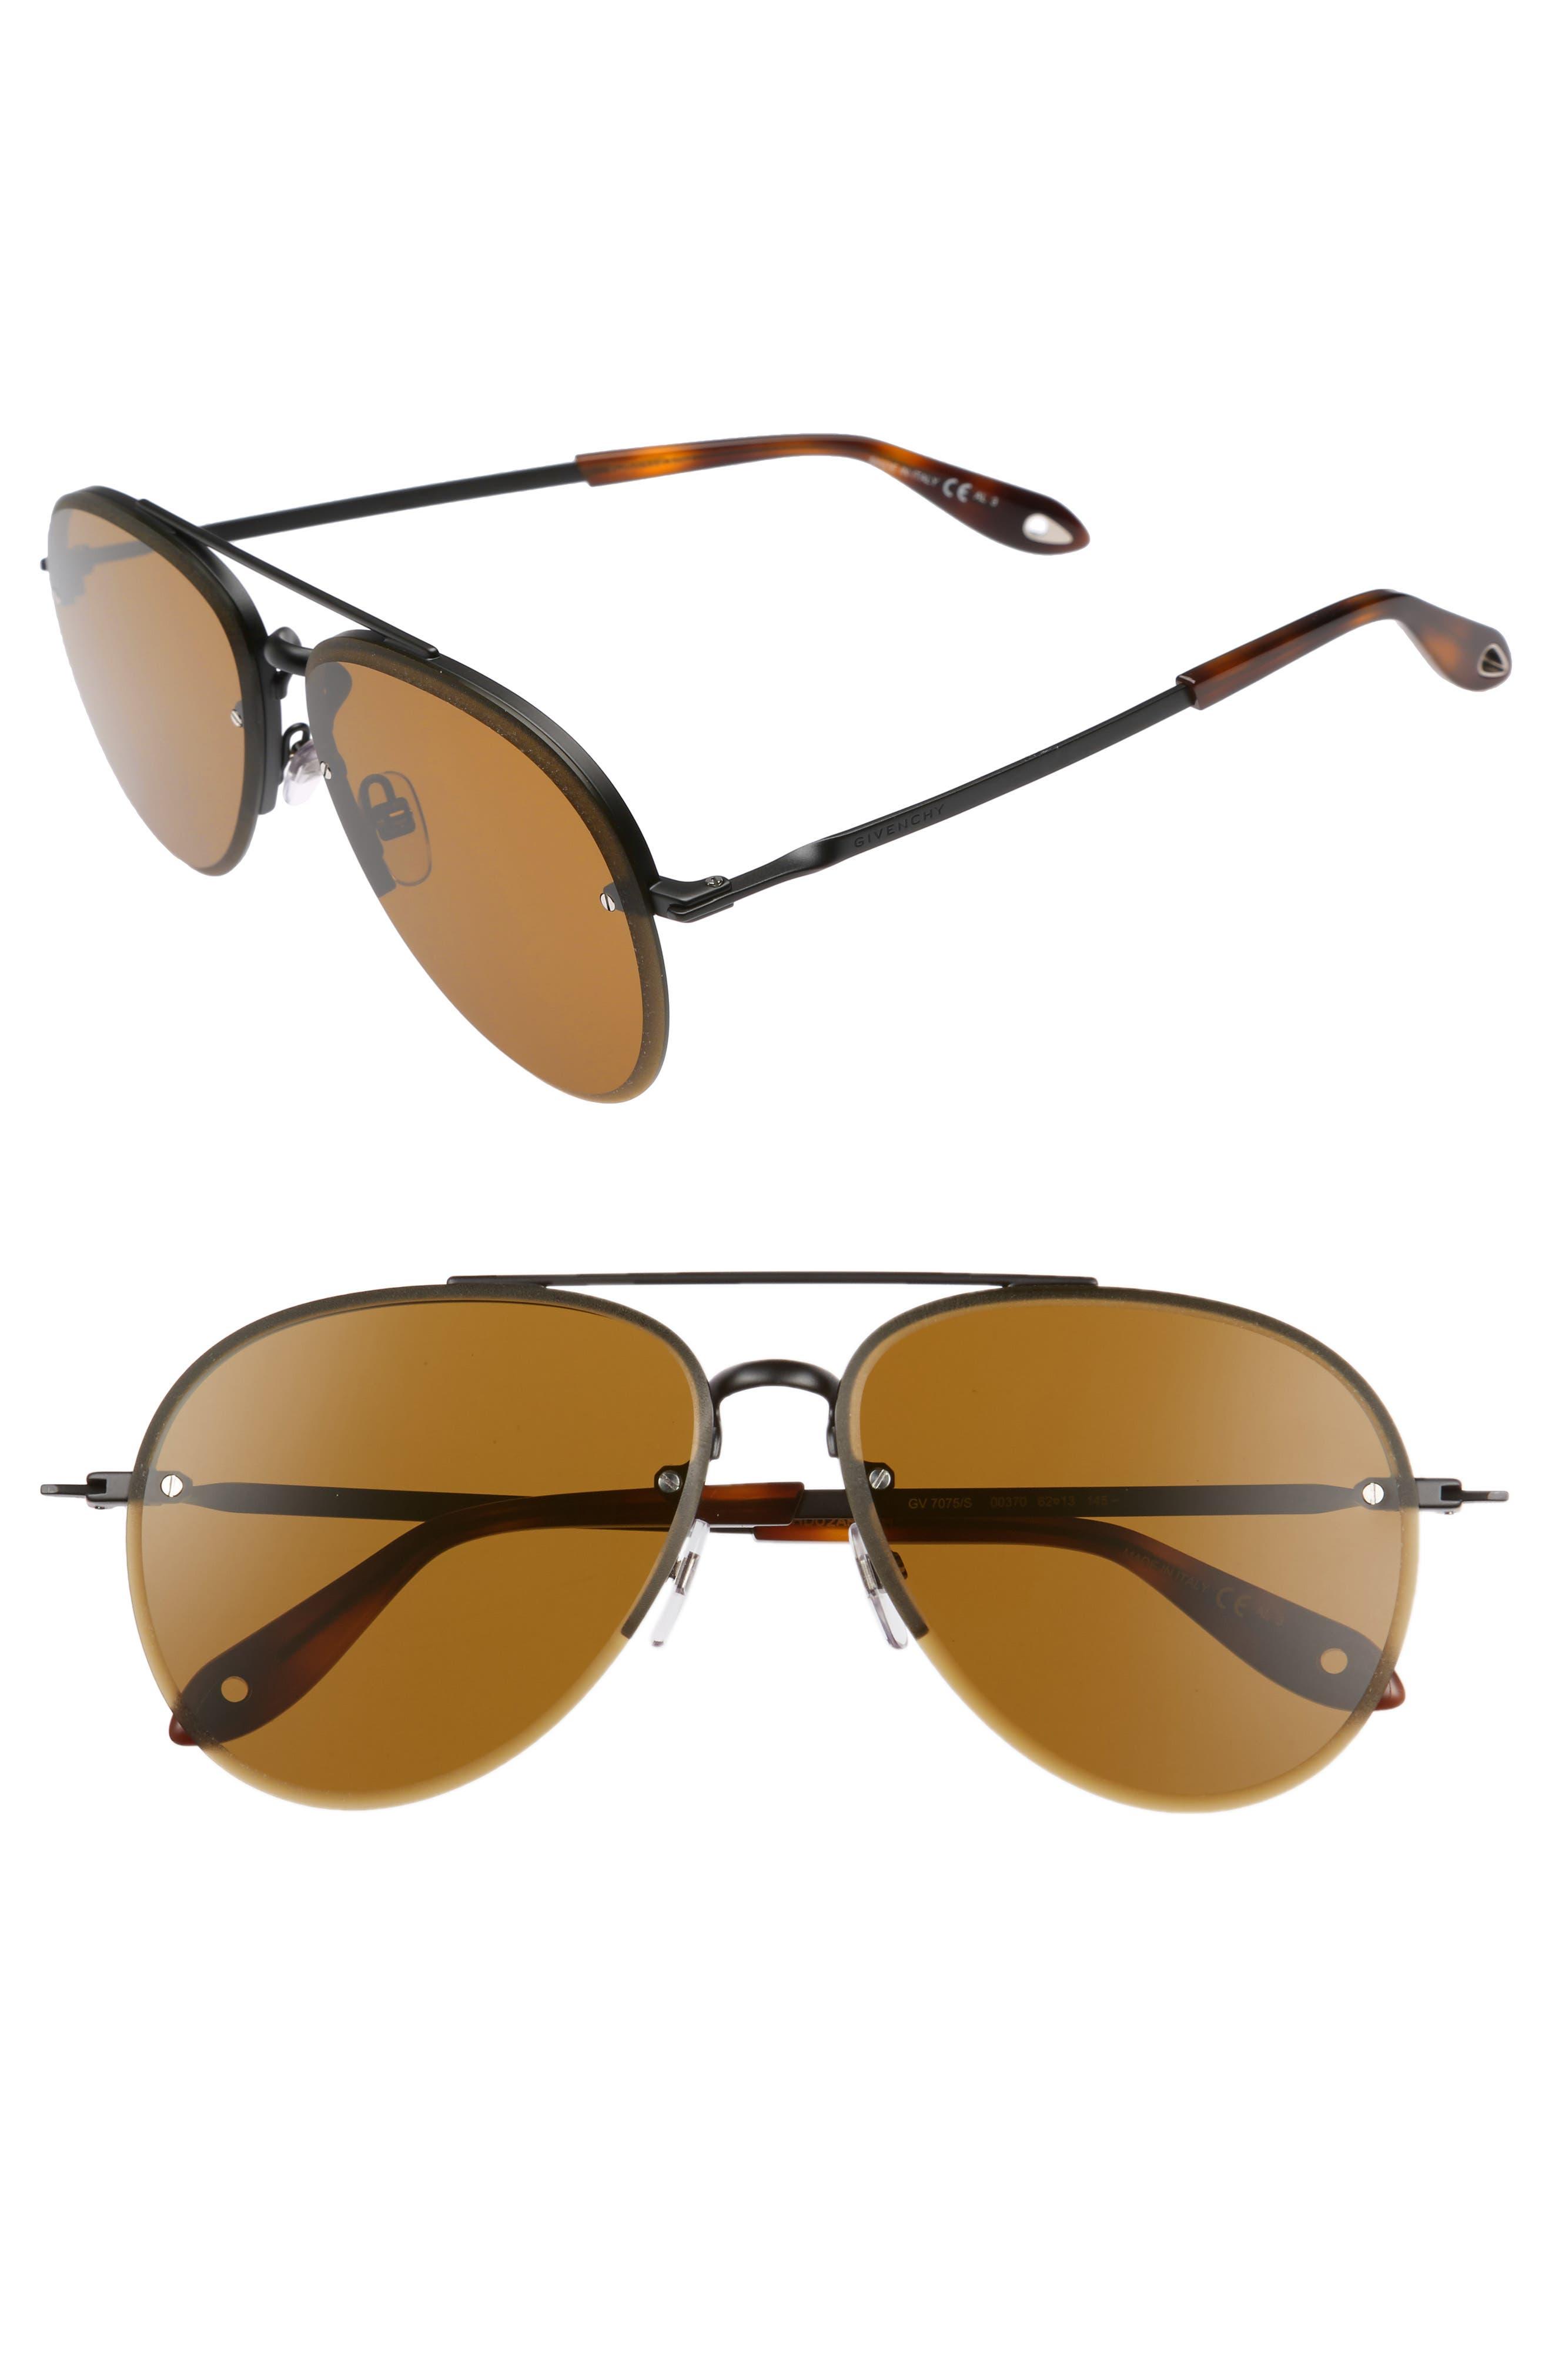 62mm Oversize Aviator Sunglasses,                         Main,                         color, 001